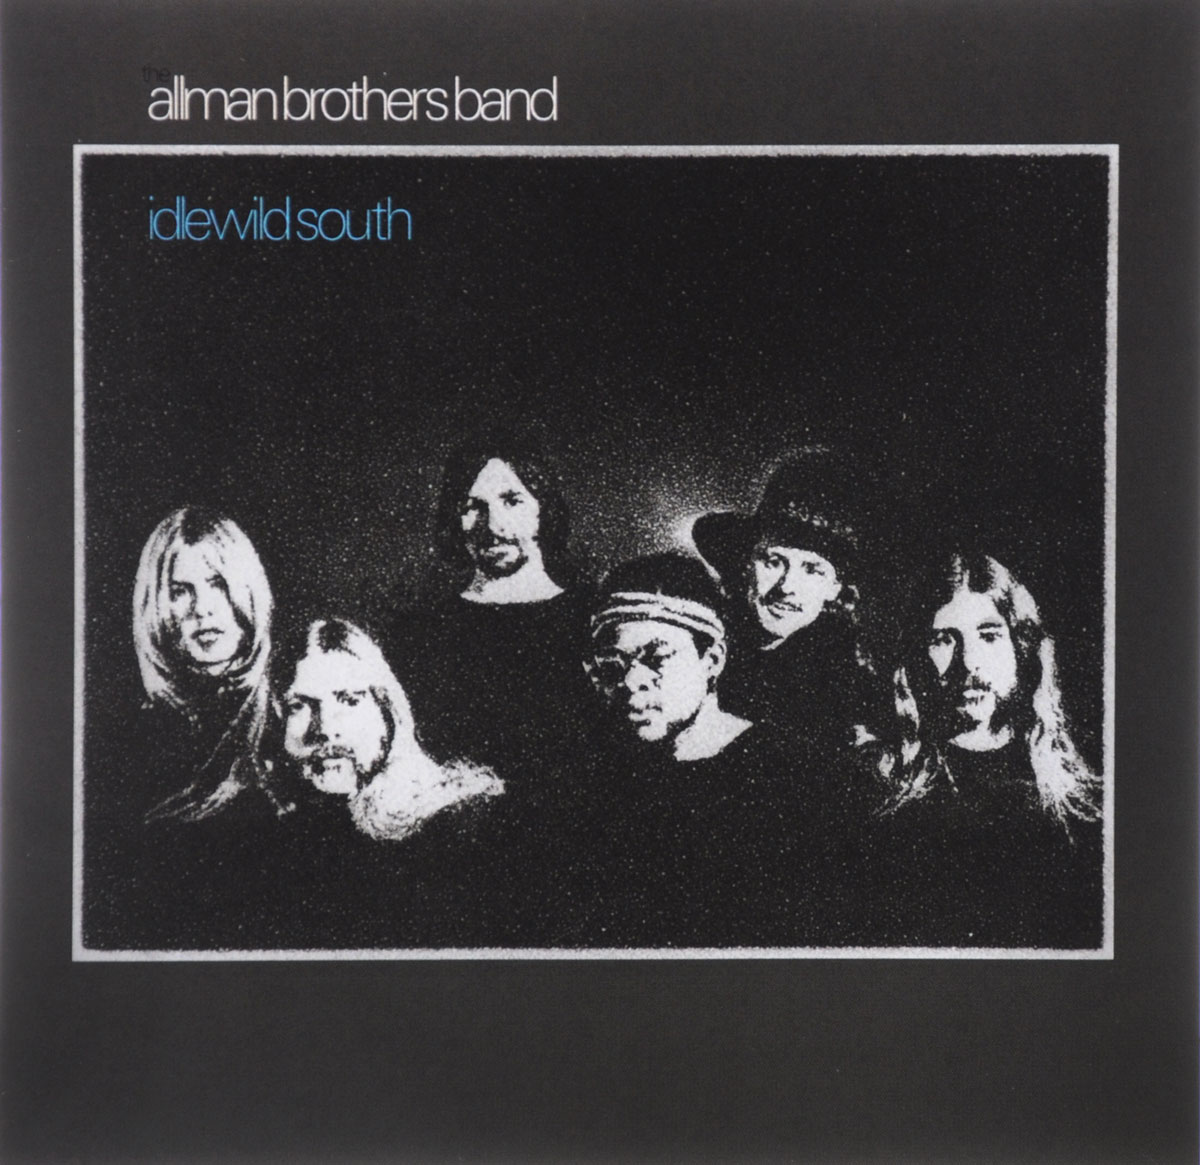 цена The Allman Brothers Band The Allman Brothers Band. Idlewild South. 45th Anniversary Remastered Edition онлайн в 2017 году